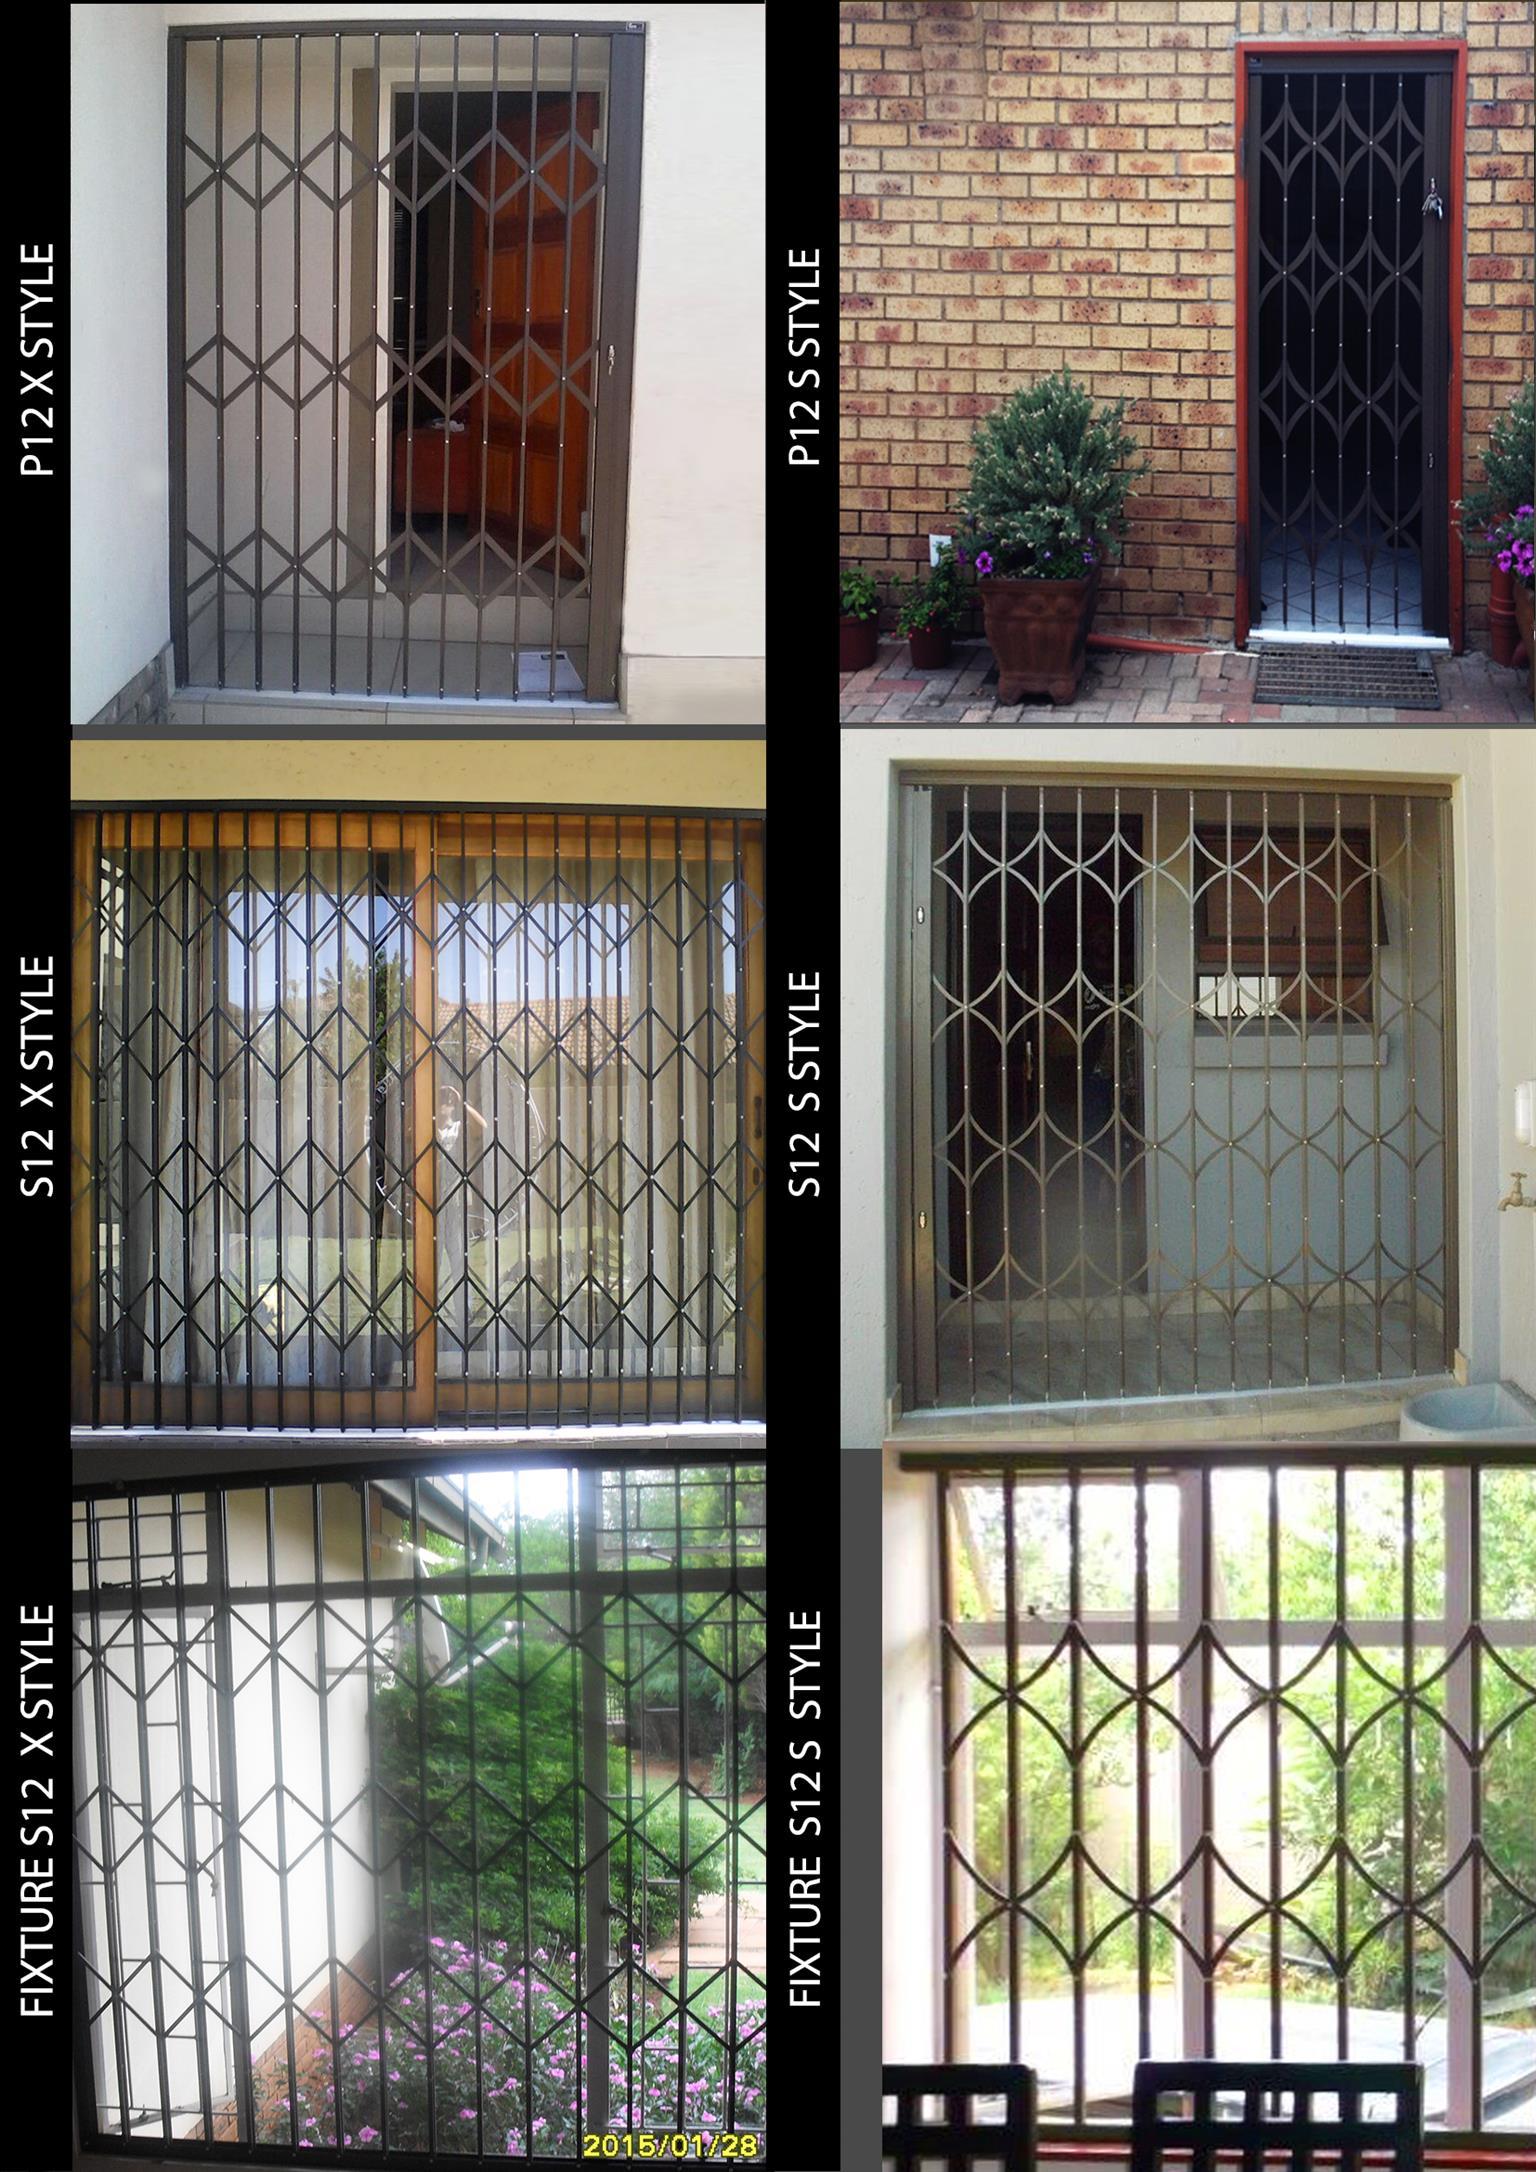 Sliding security doors and windows